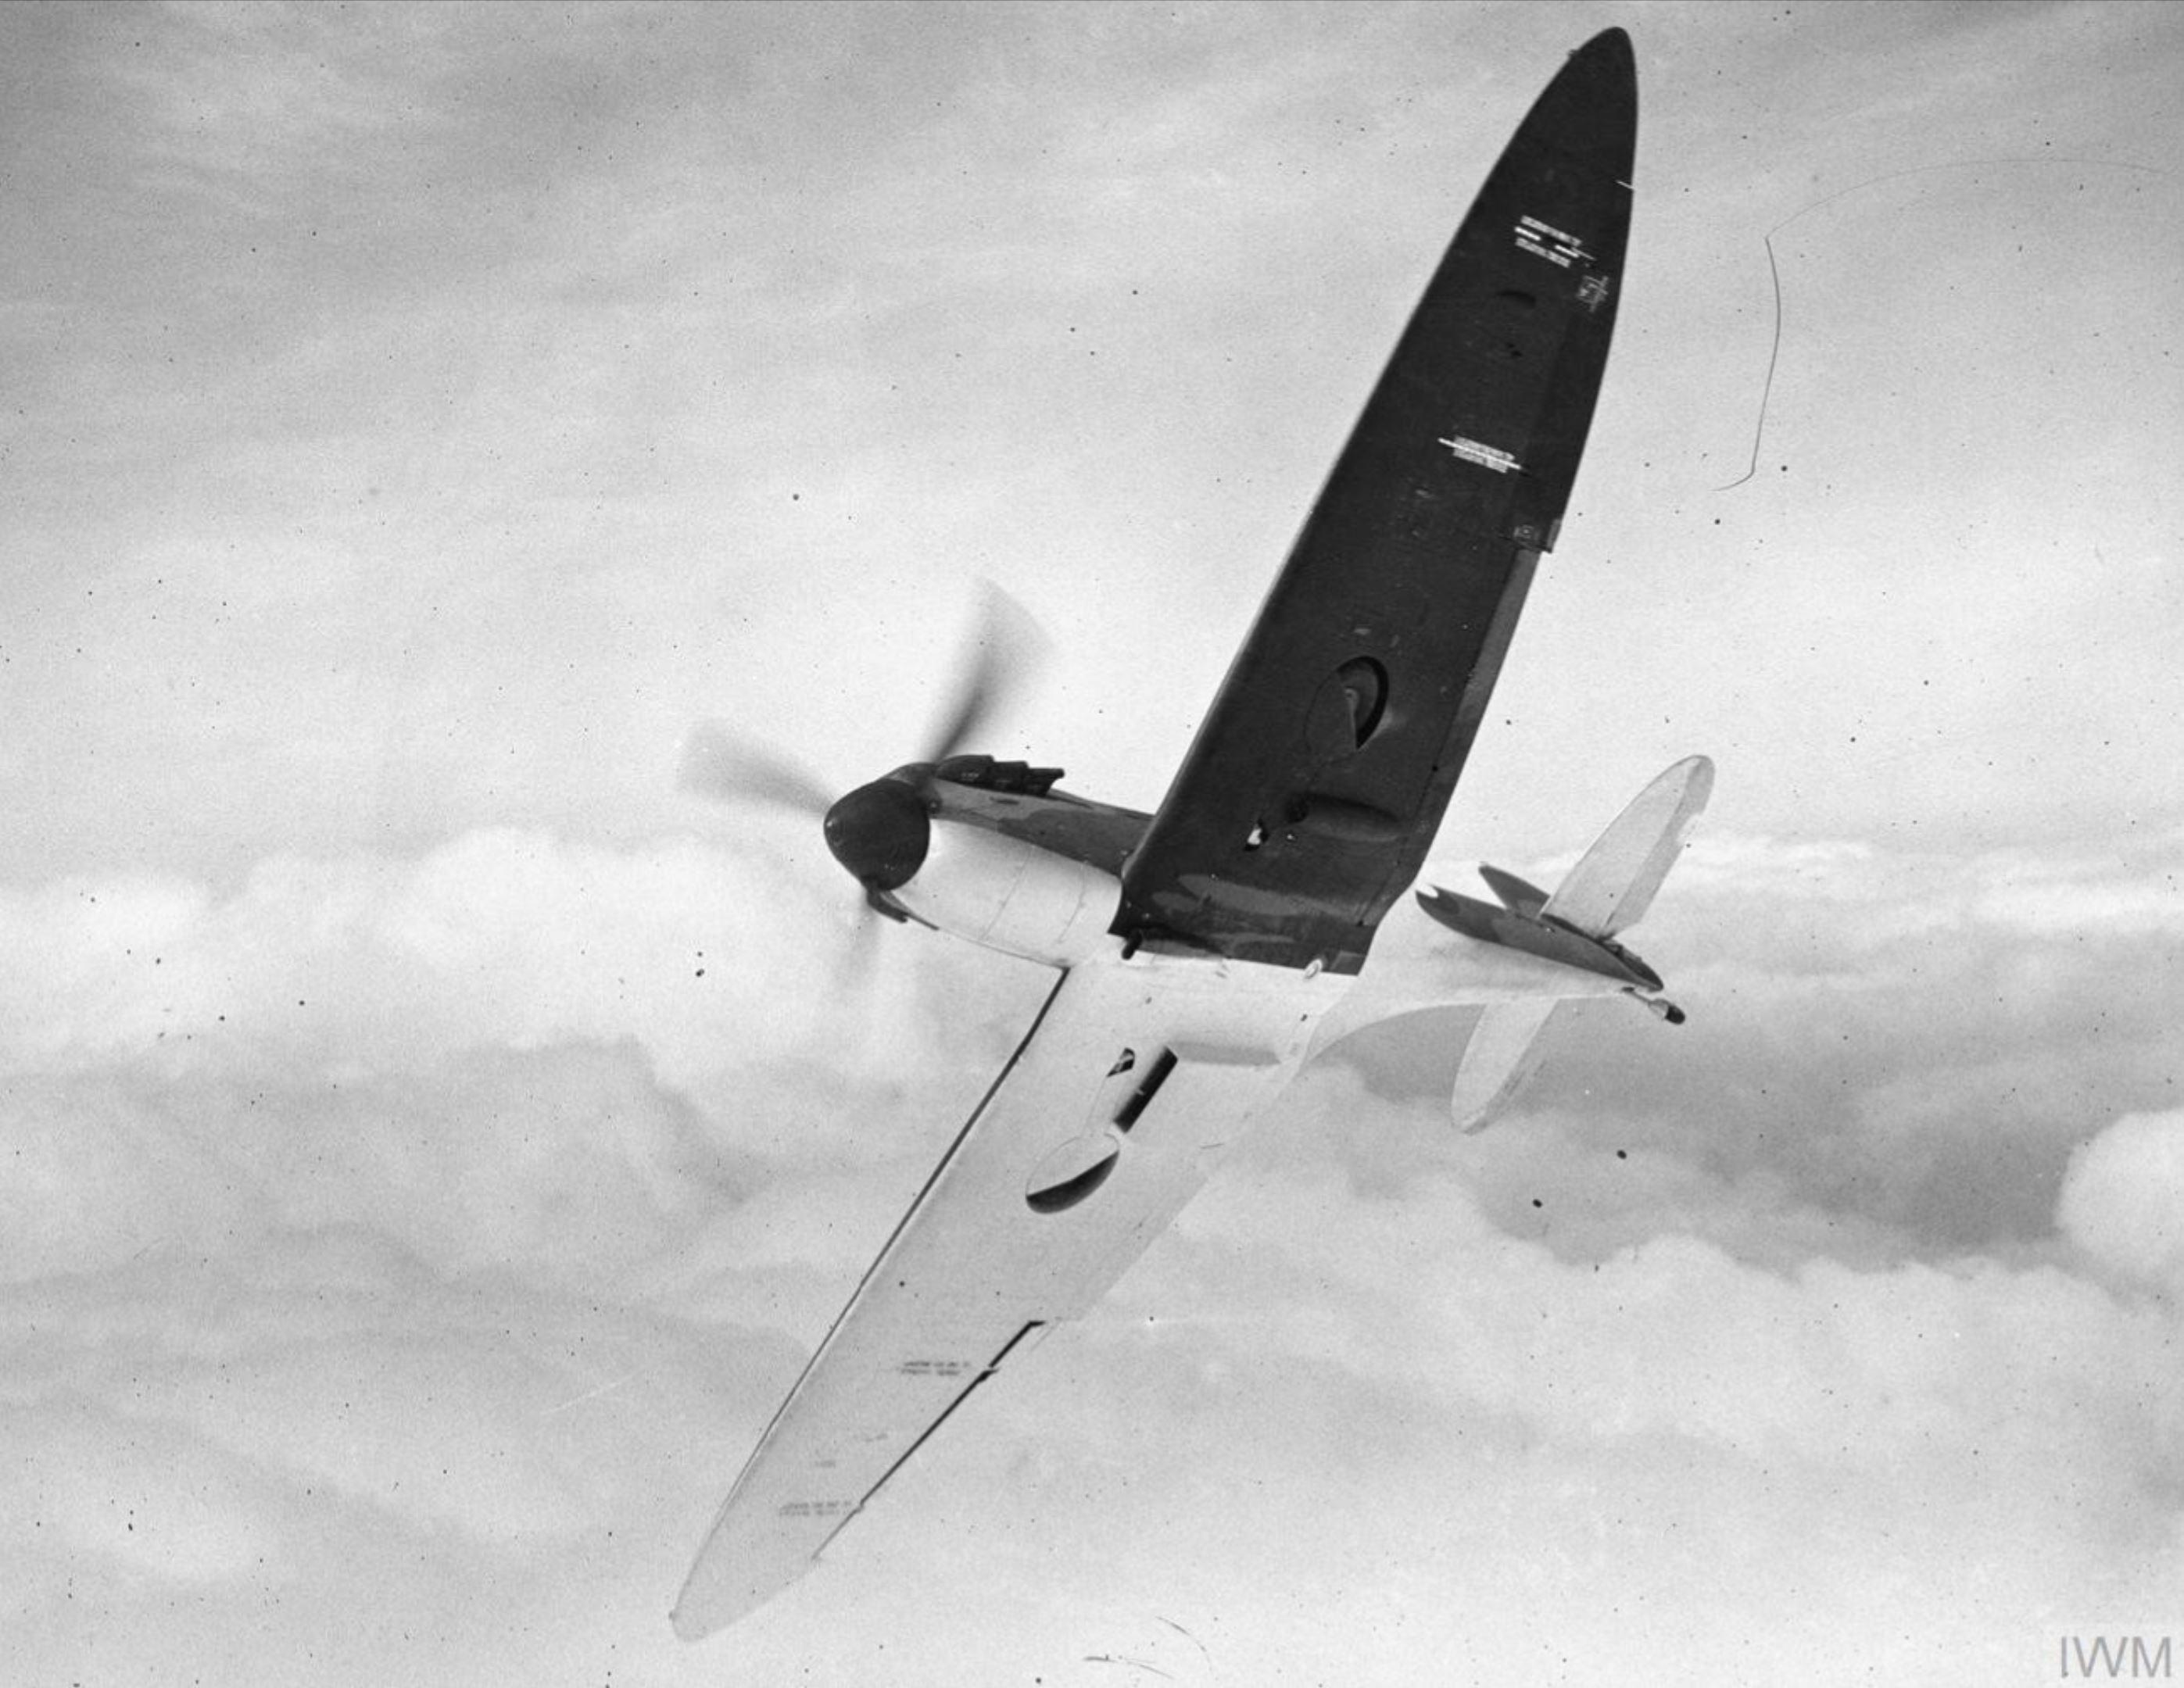 Spitfire MkI factory fresh P9450 Apr 1940 later RAF 64Sqn IWM HU104745